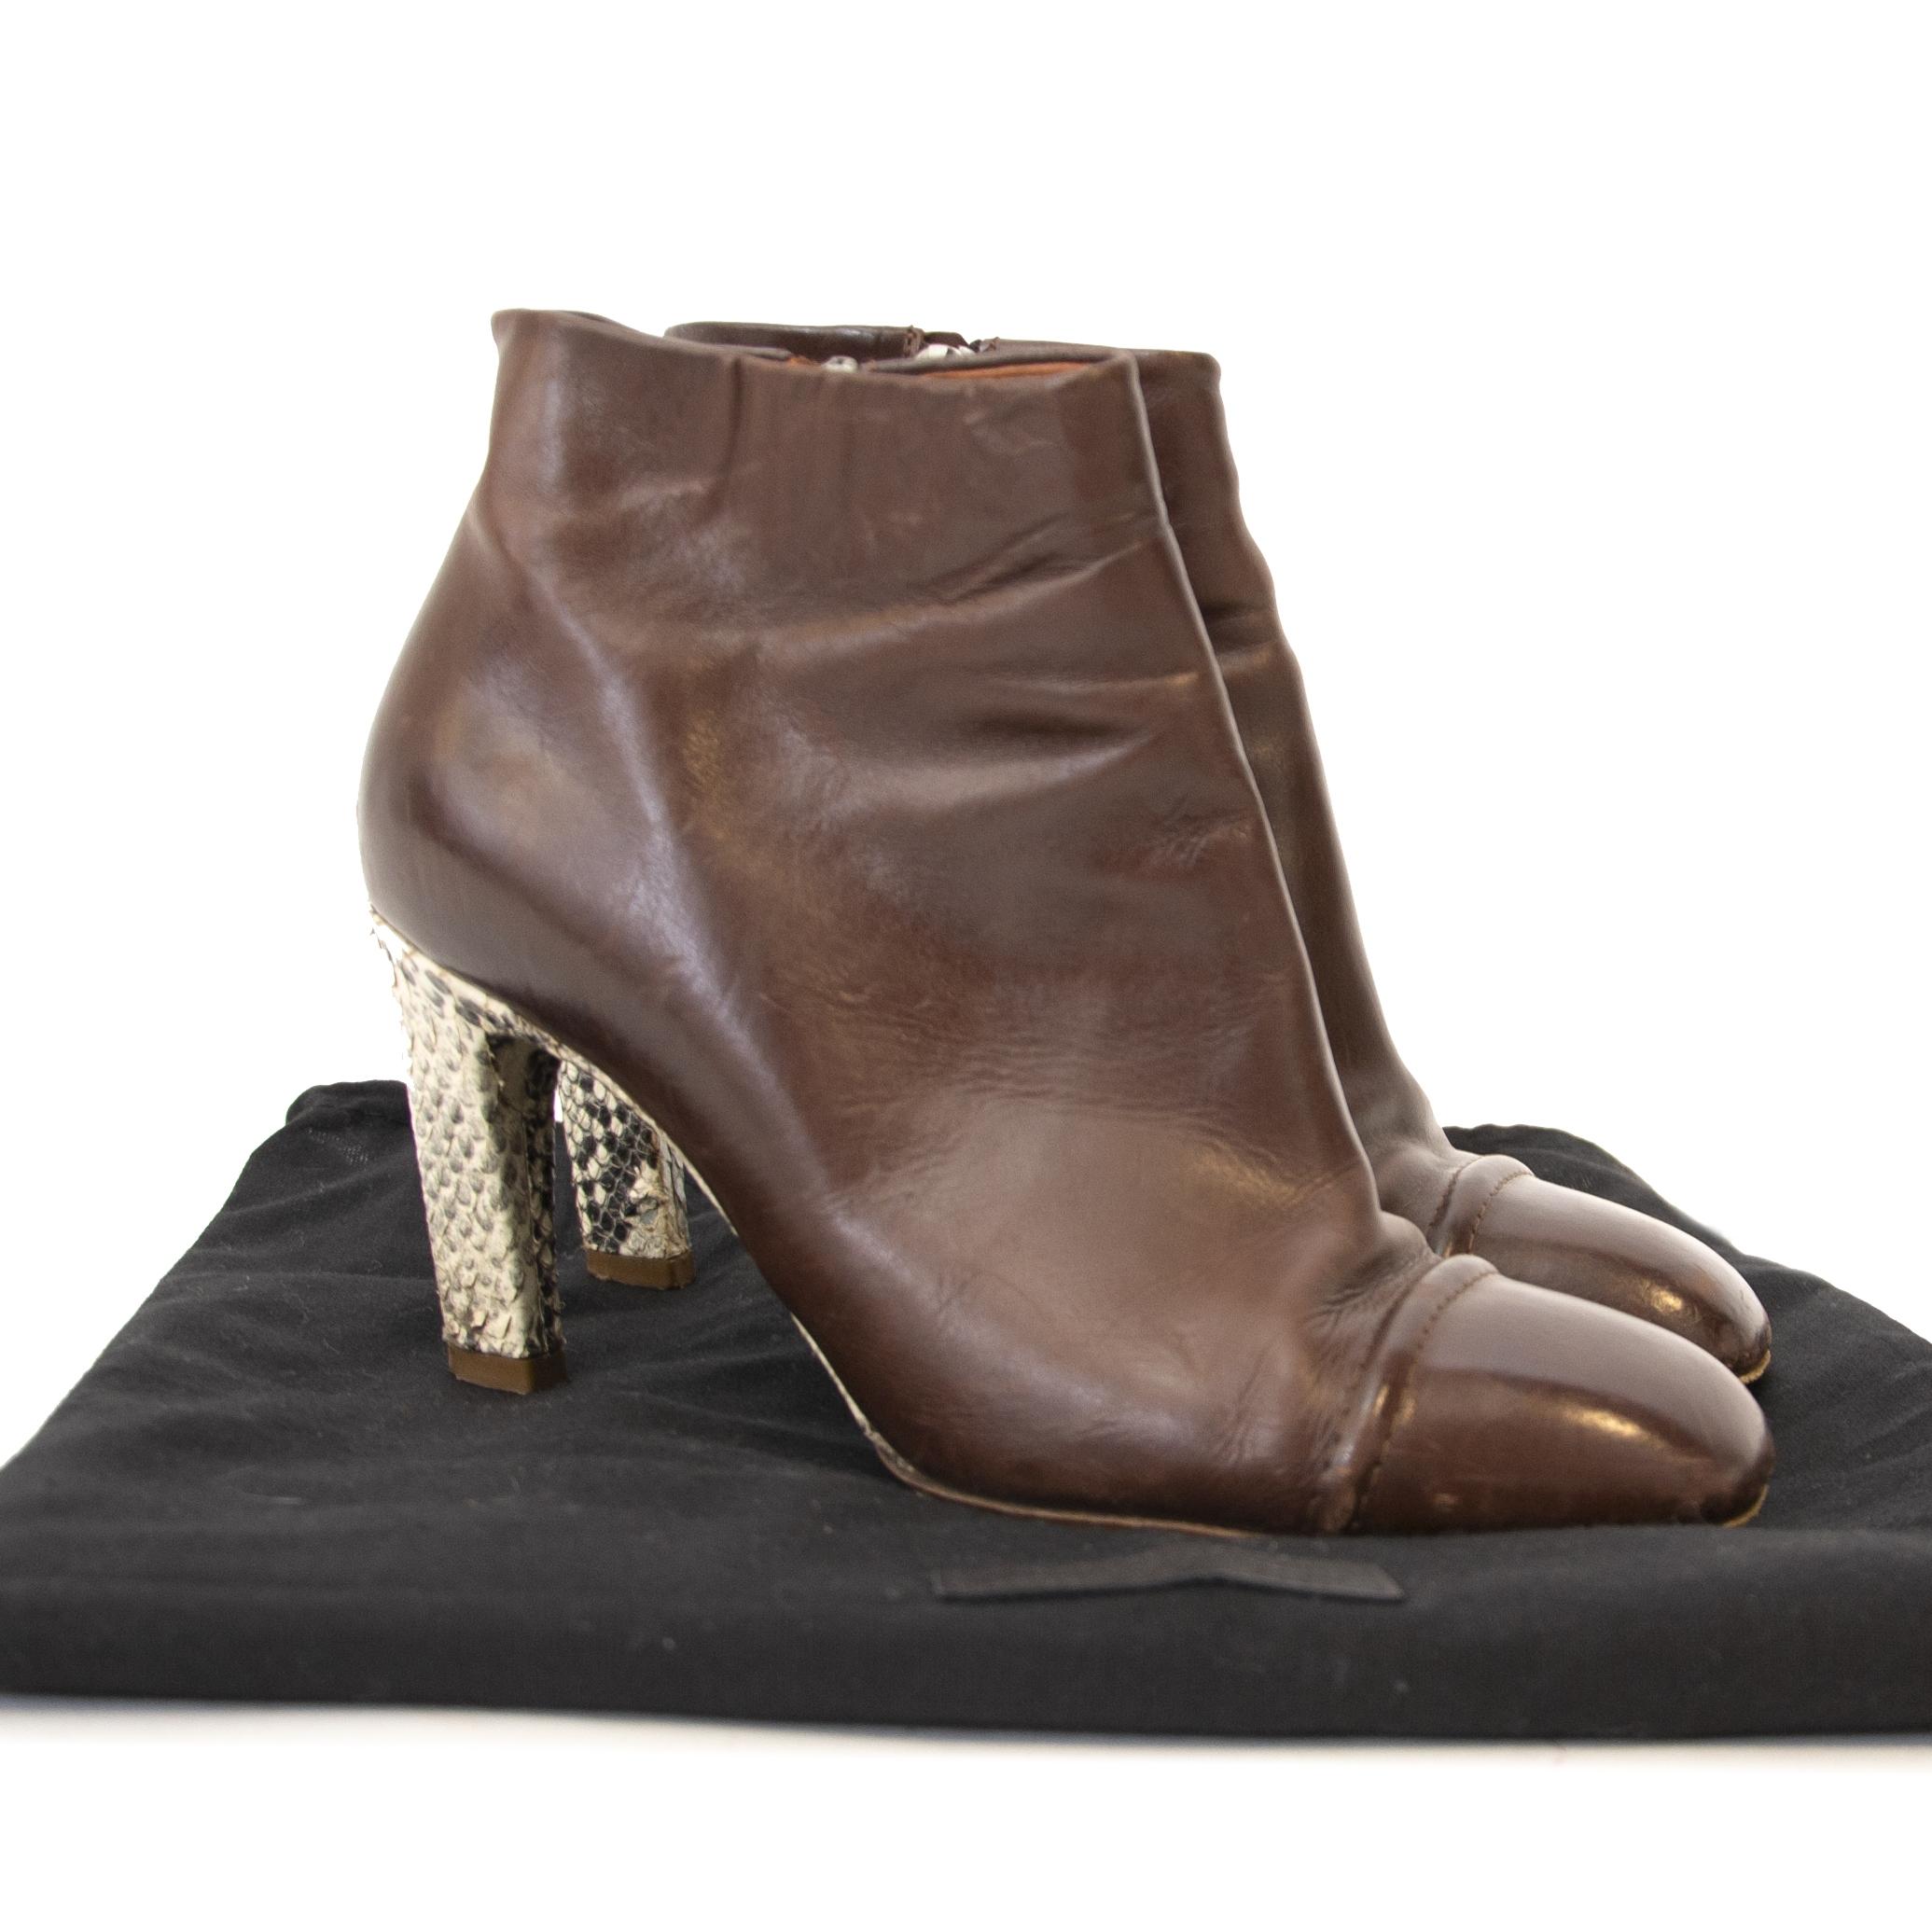 334e73749c3 ... Size 36 at Labellov Dries Van Noten Brown Python Ankle Boots at  Labellov. Online webshop vintage designer handbags